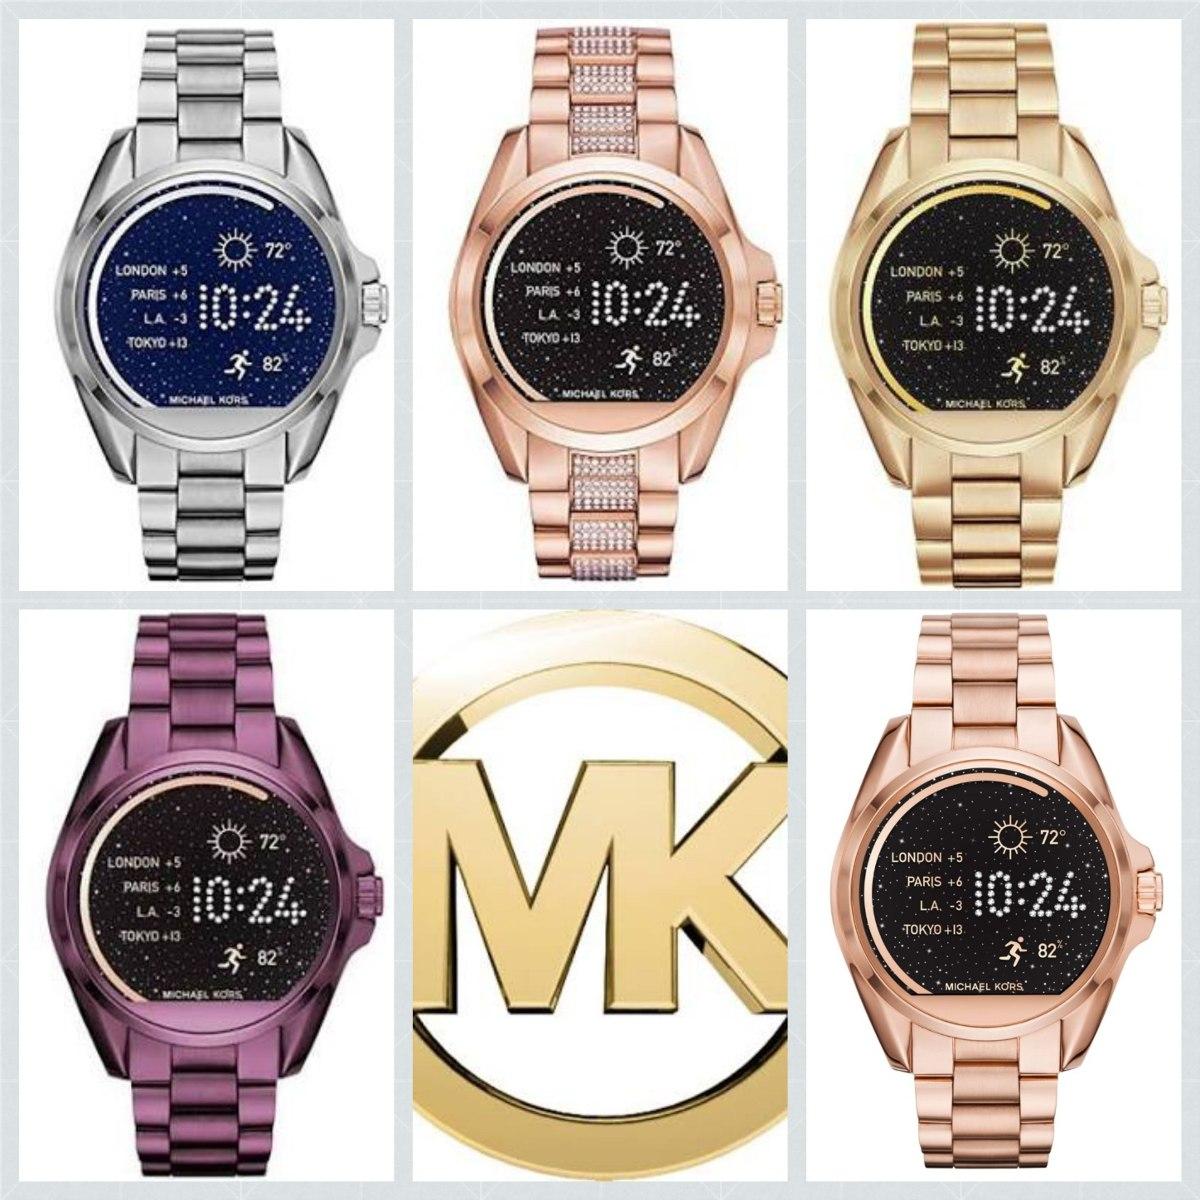 8802d1f0ffba reloj michael kors rosado  smartwatch mk rose gold mkt5013. Cargando zoom.